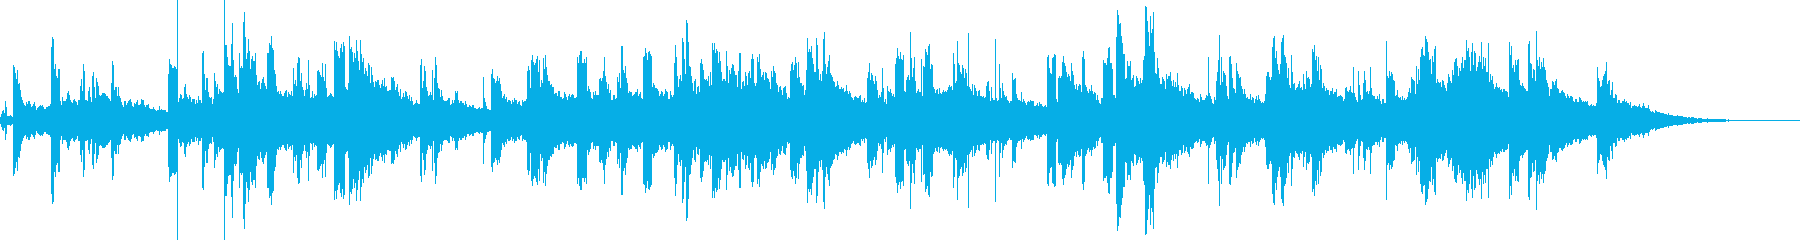 KANT近未来アンビエント01104の再生済みの波形